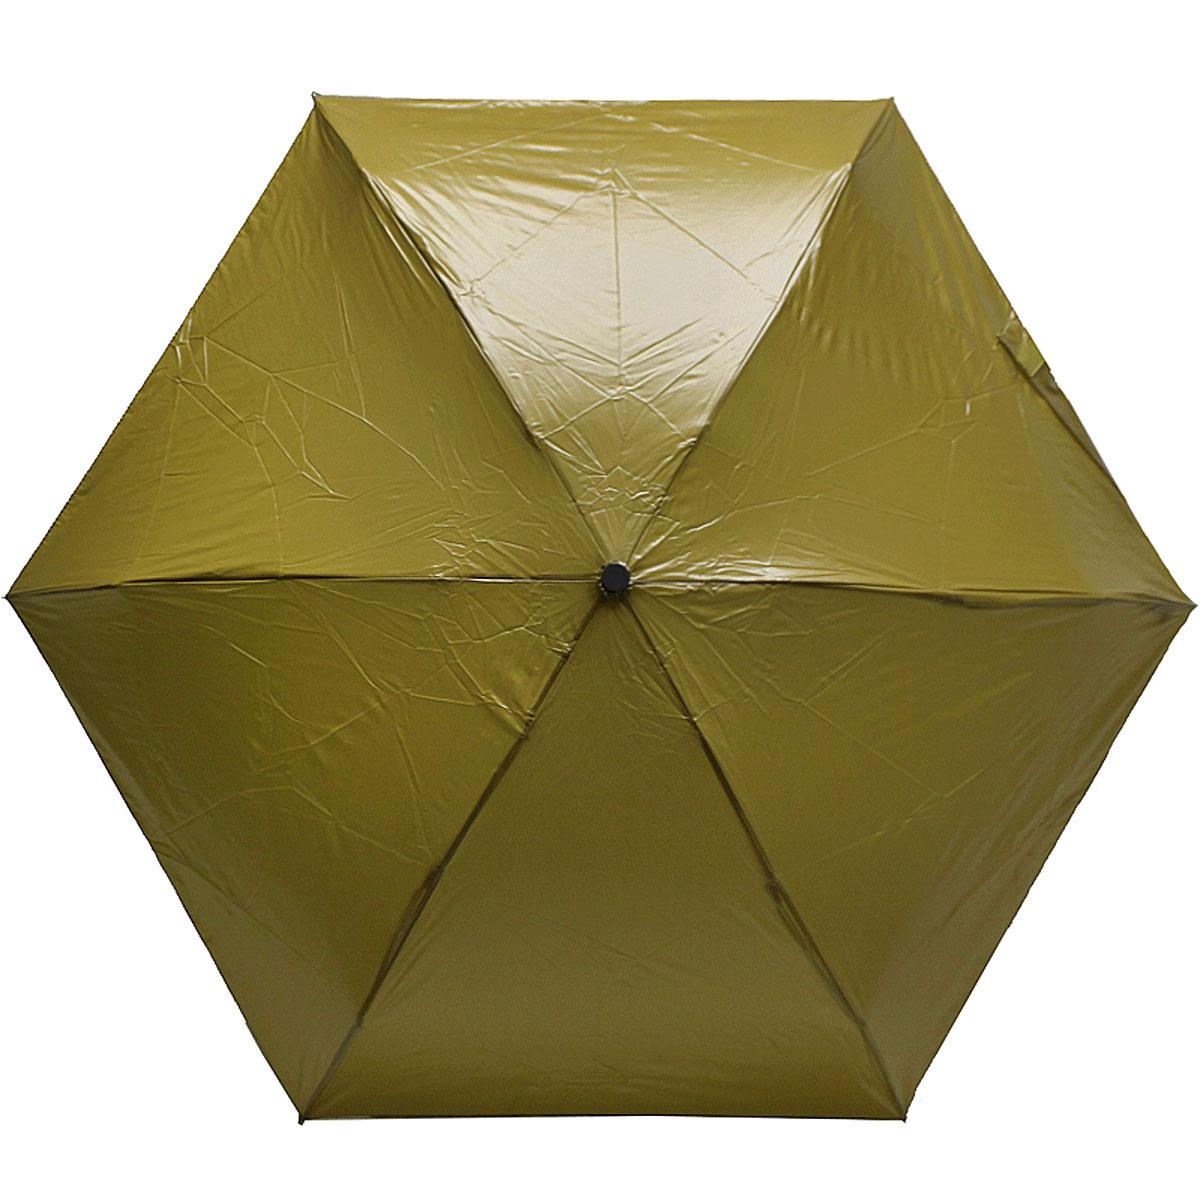 Зонт женский Vogue, цвет: хаки. 454V-2 цена и фото